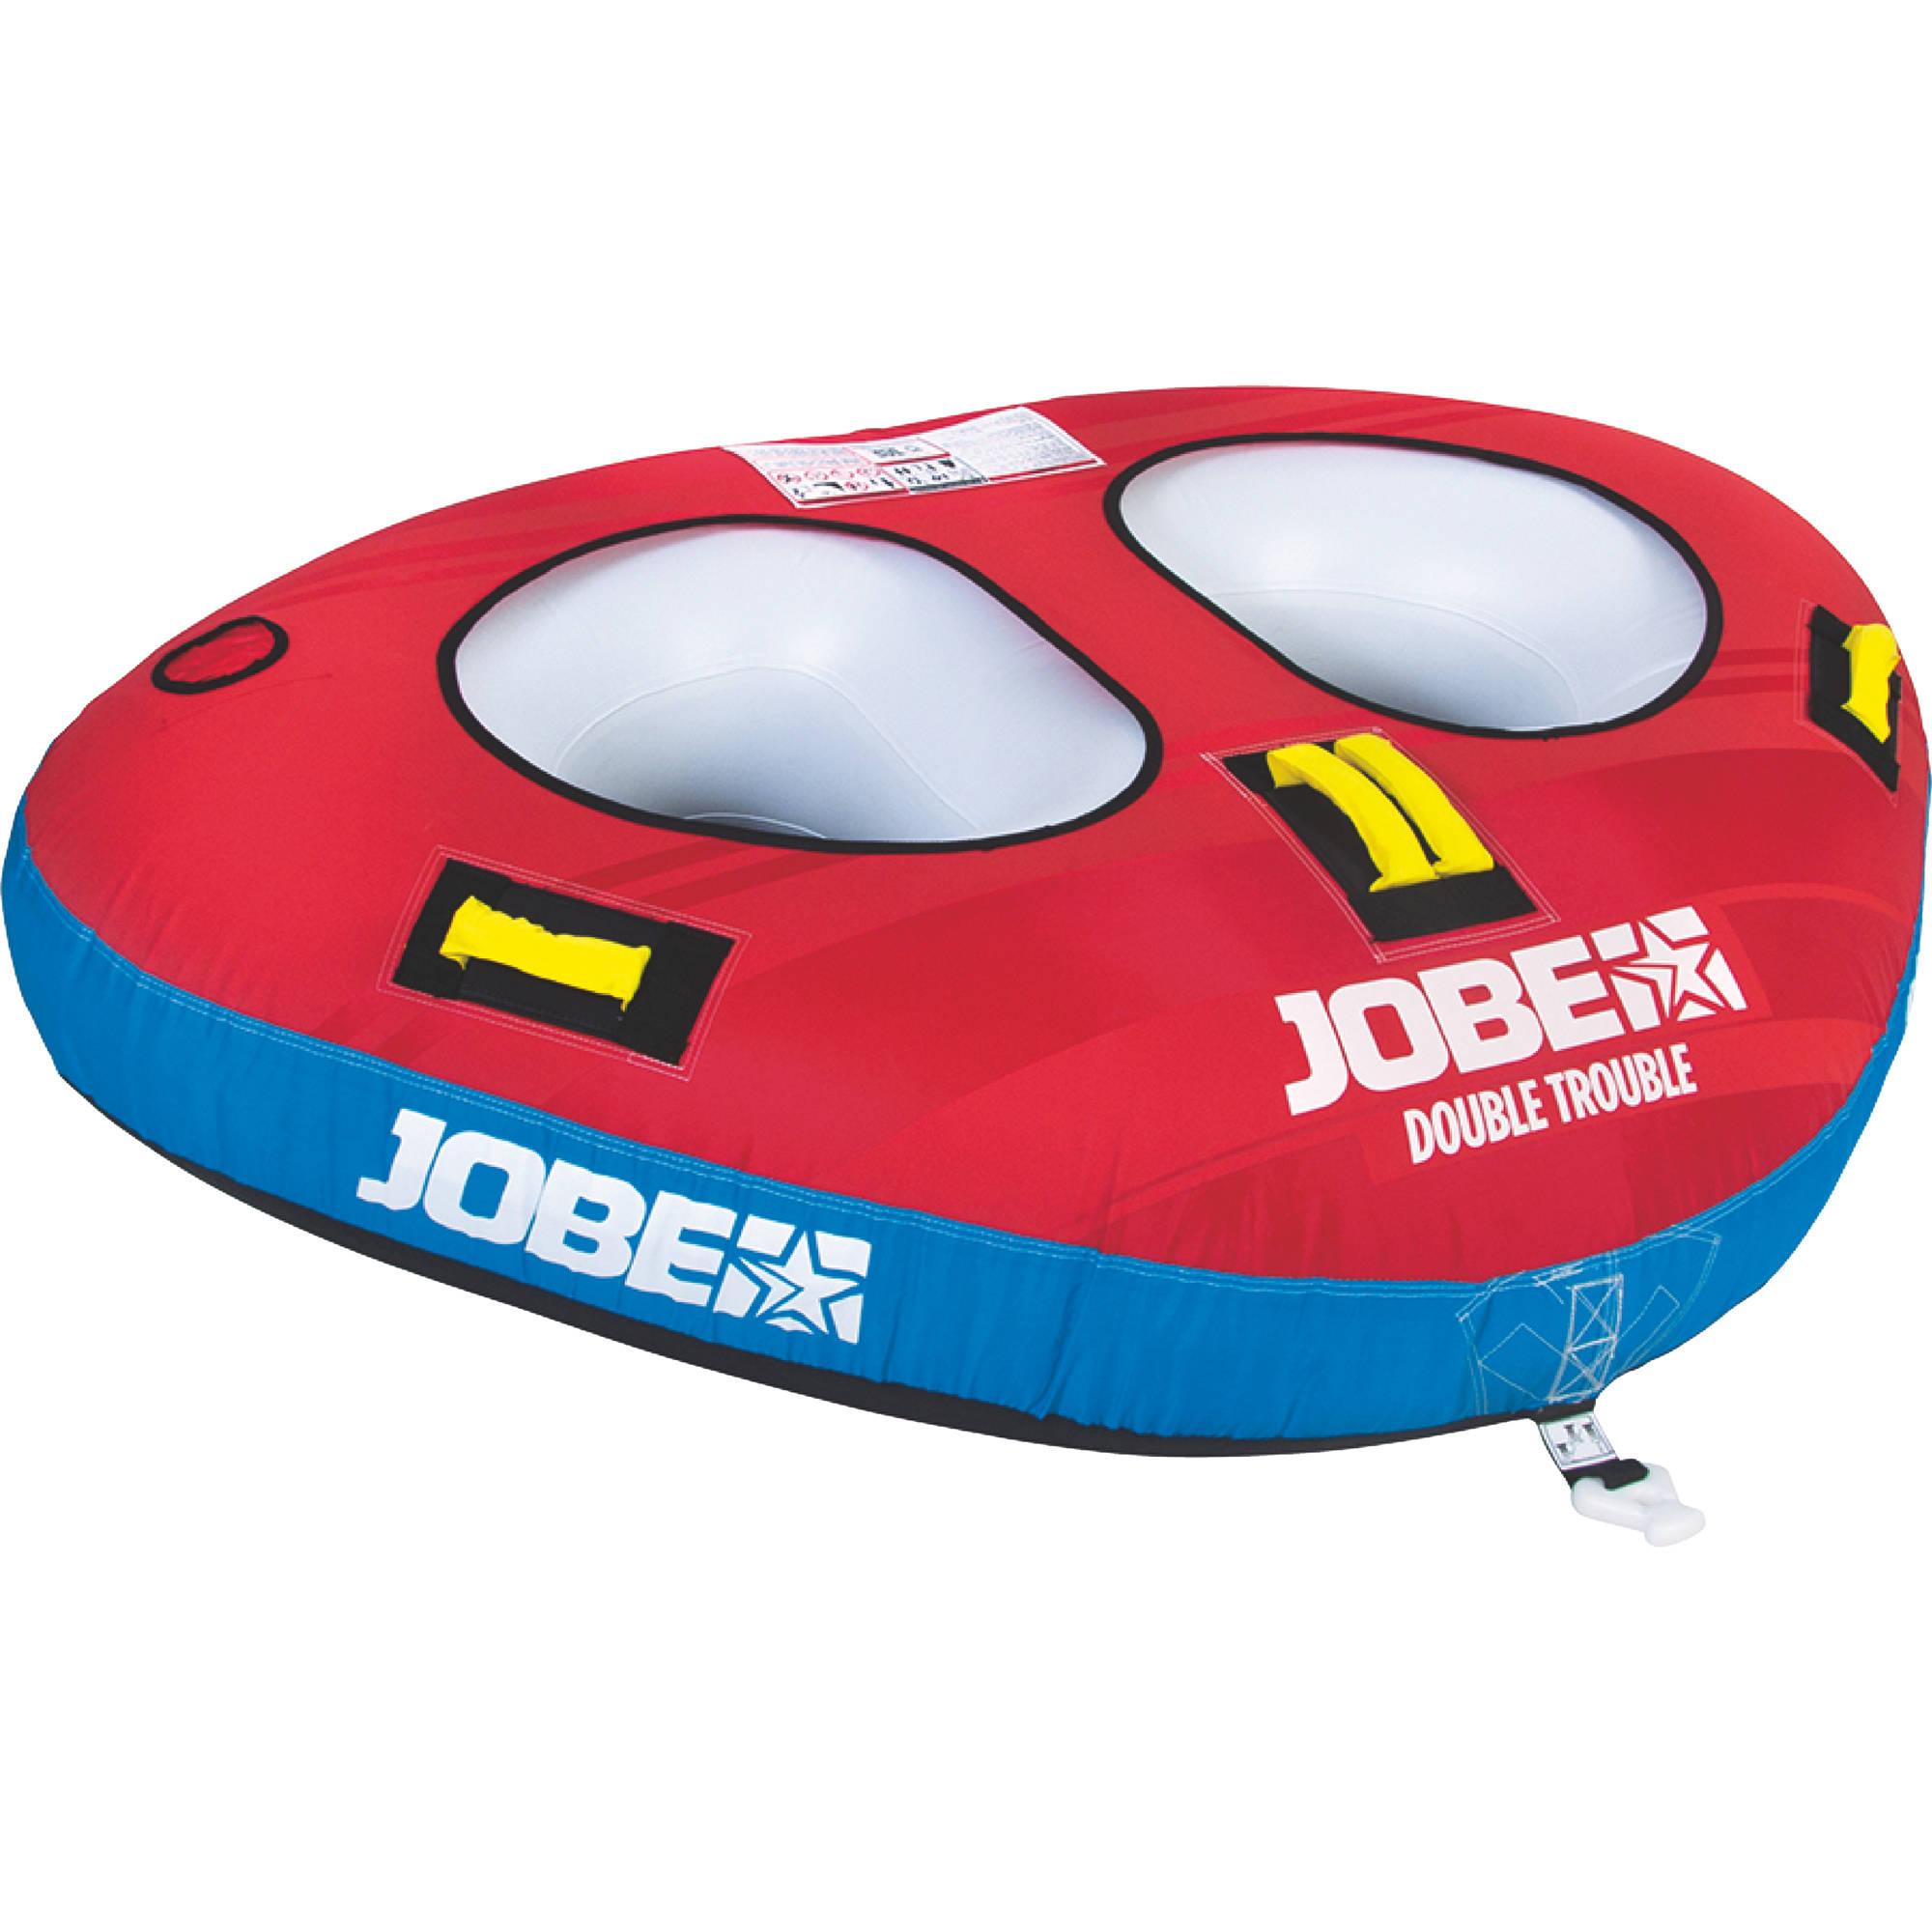 Jobe Double Trouble Towable Tube, 2 Person